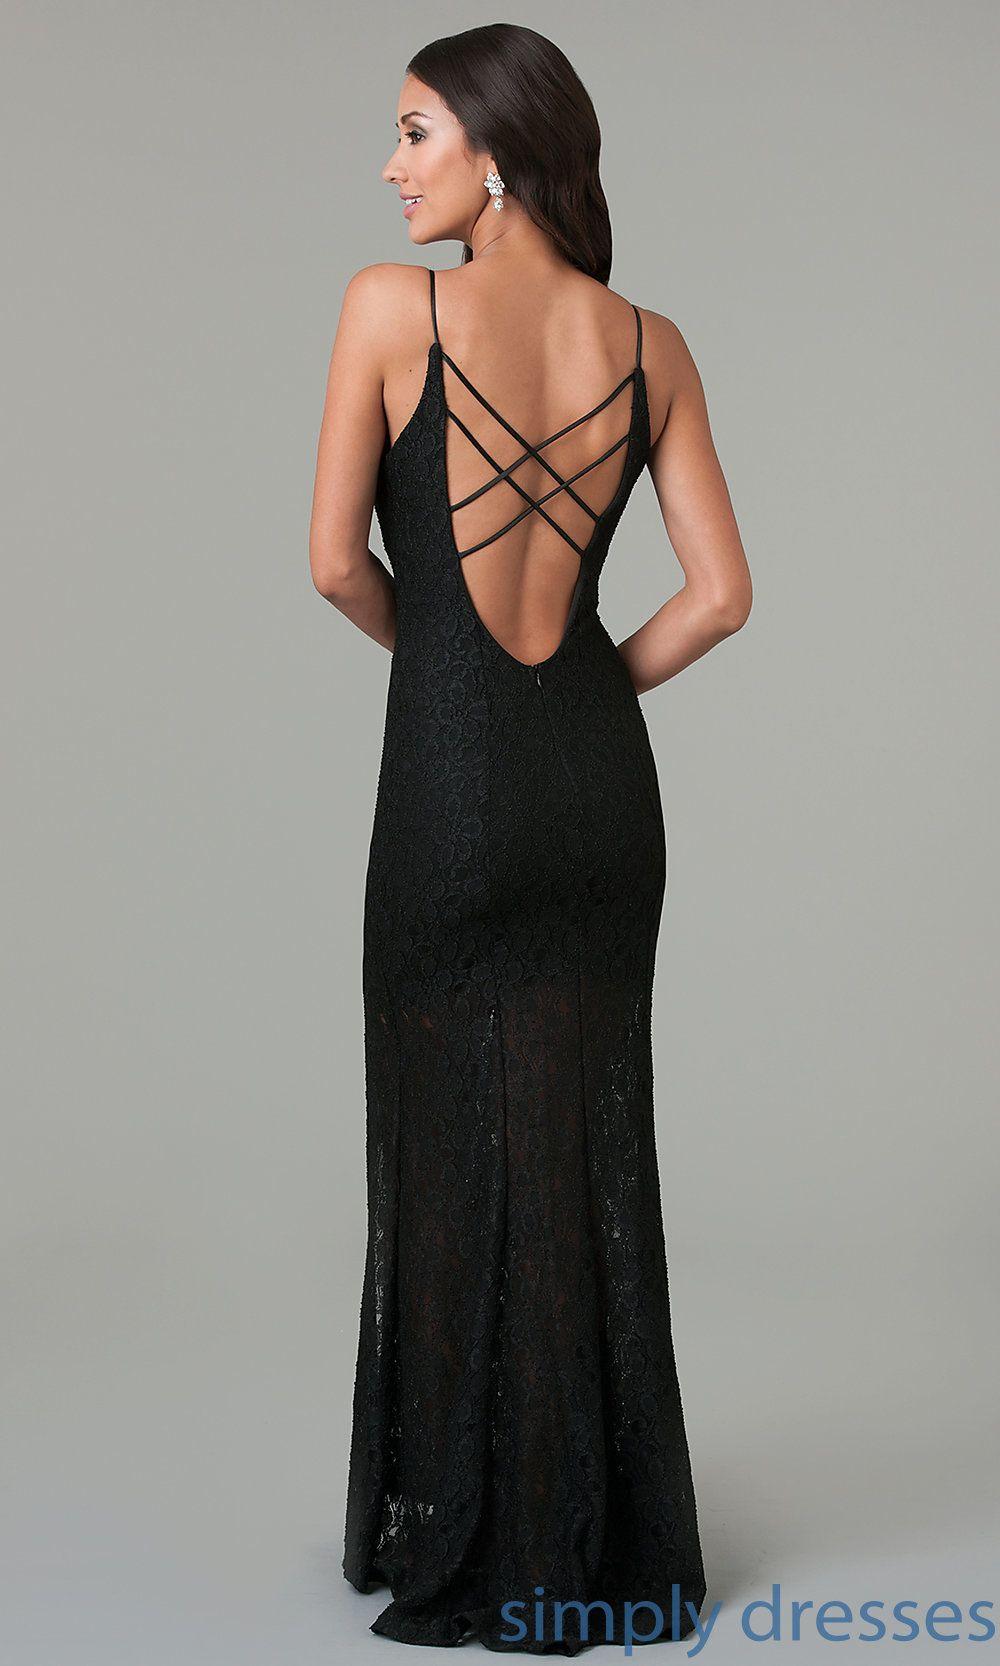 Open Back Black Lace Evening Gown Black Lace Evening Gown Black Lace Evening Dress Dresses [ 1666 x 1000 Pixel ]